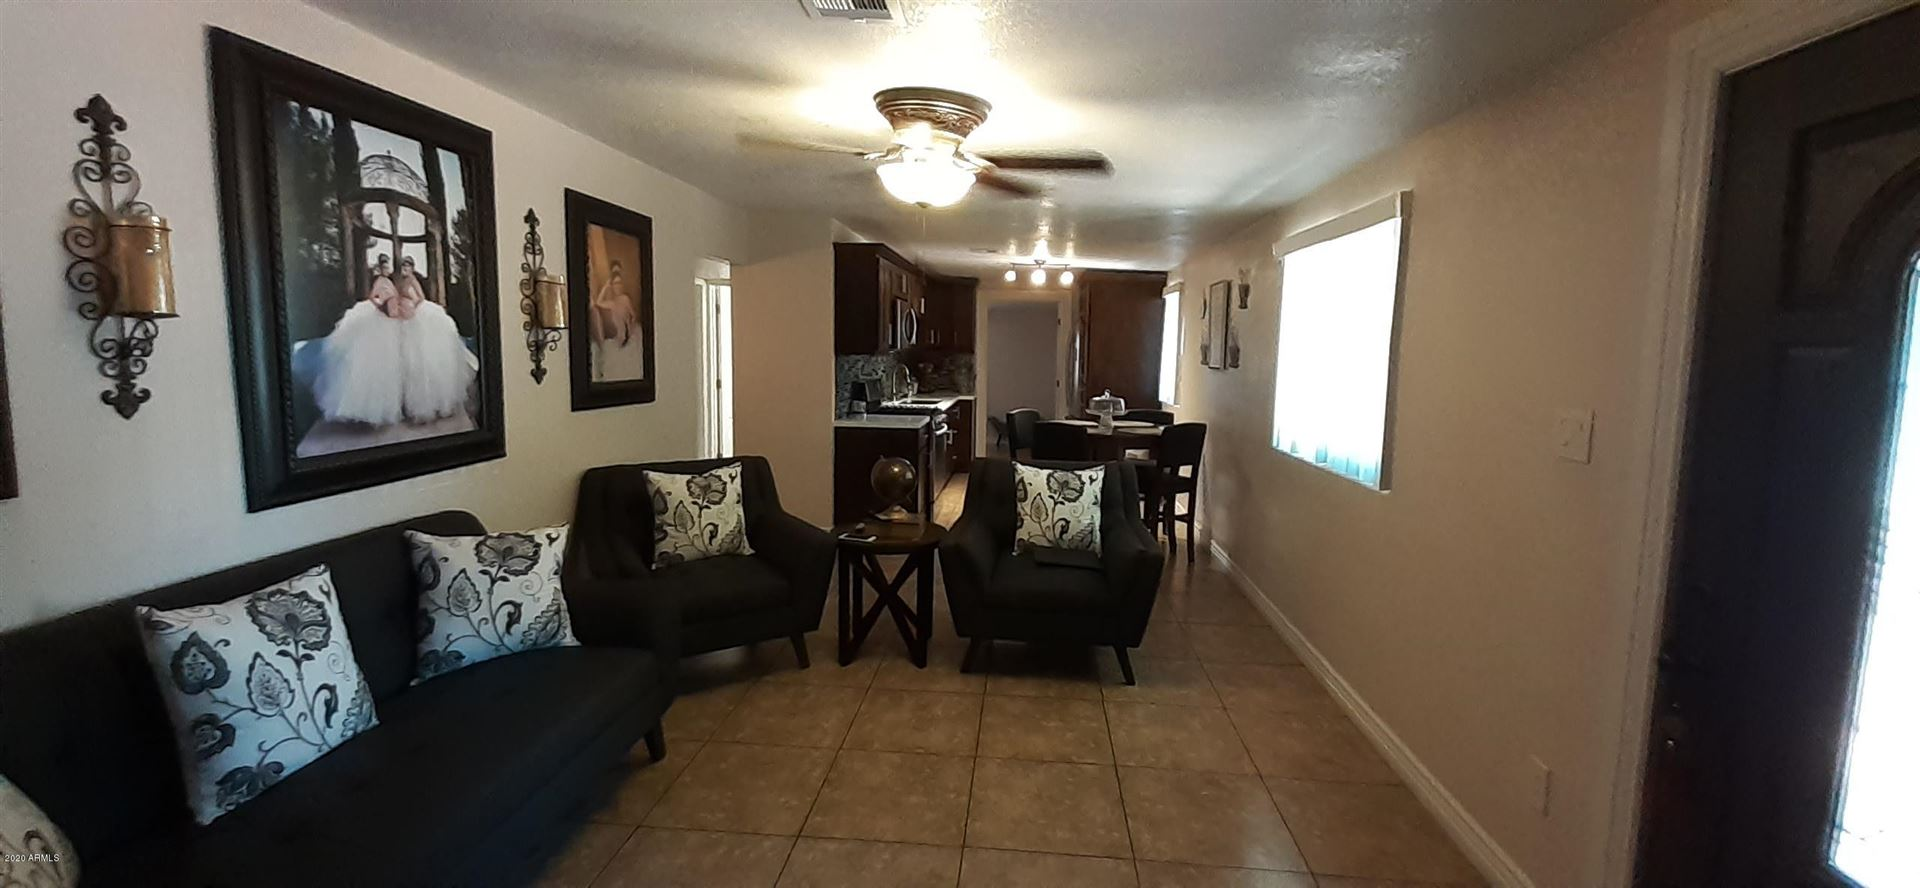 3852 N 63RD Drive, Phoenix, AZ 85033 - MLS#: 6096272